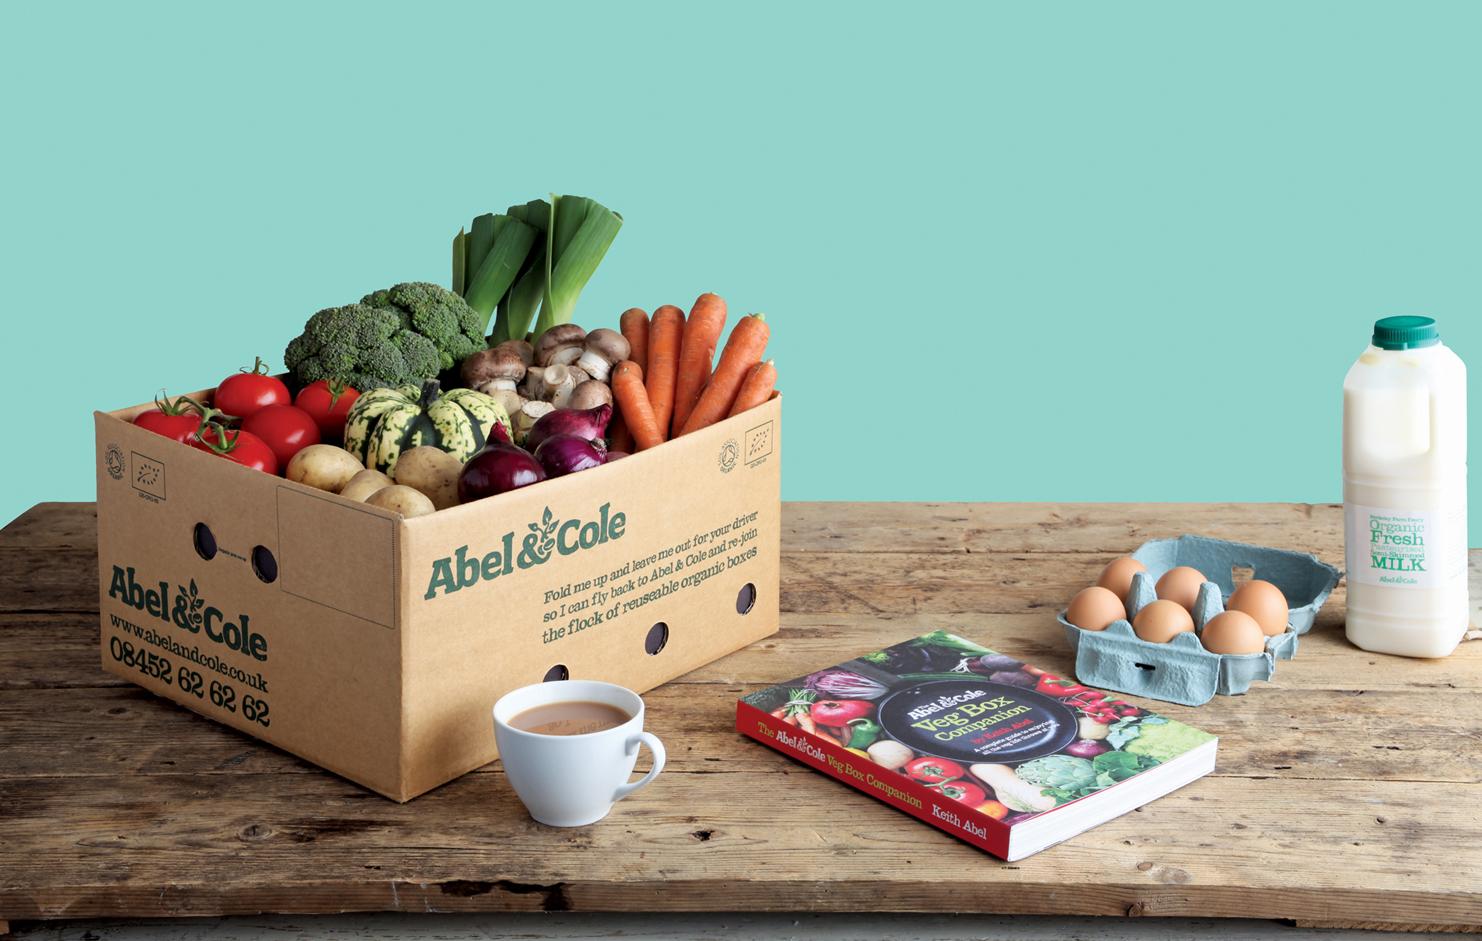 Abel & Cole Organic Food & Drink – Home deliveries